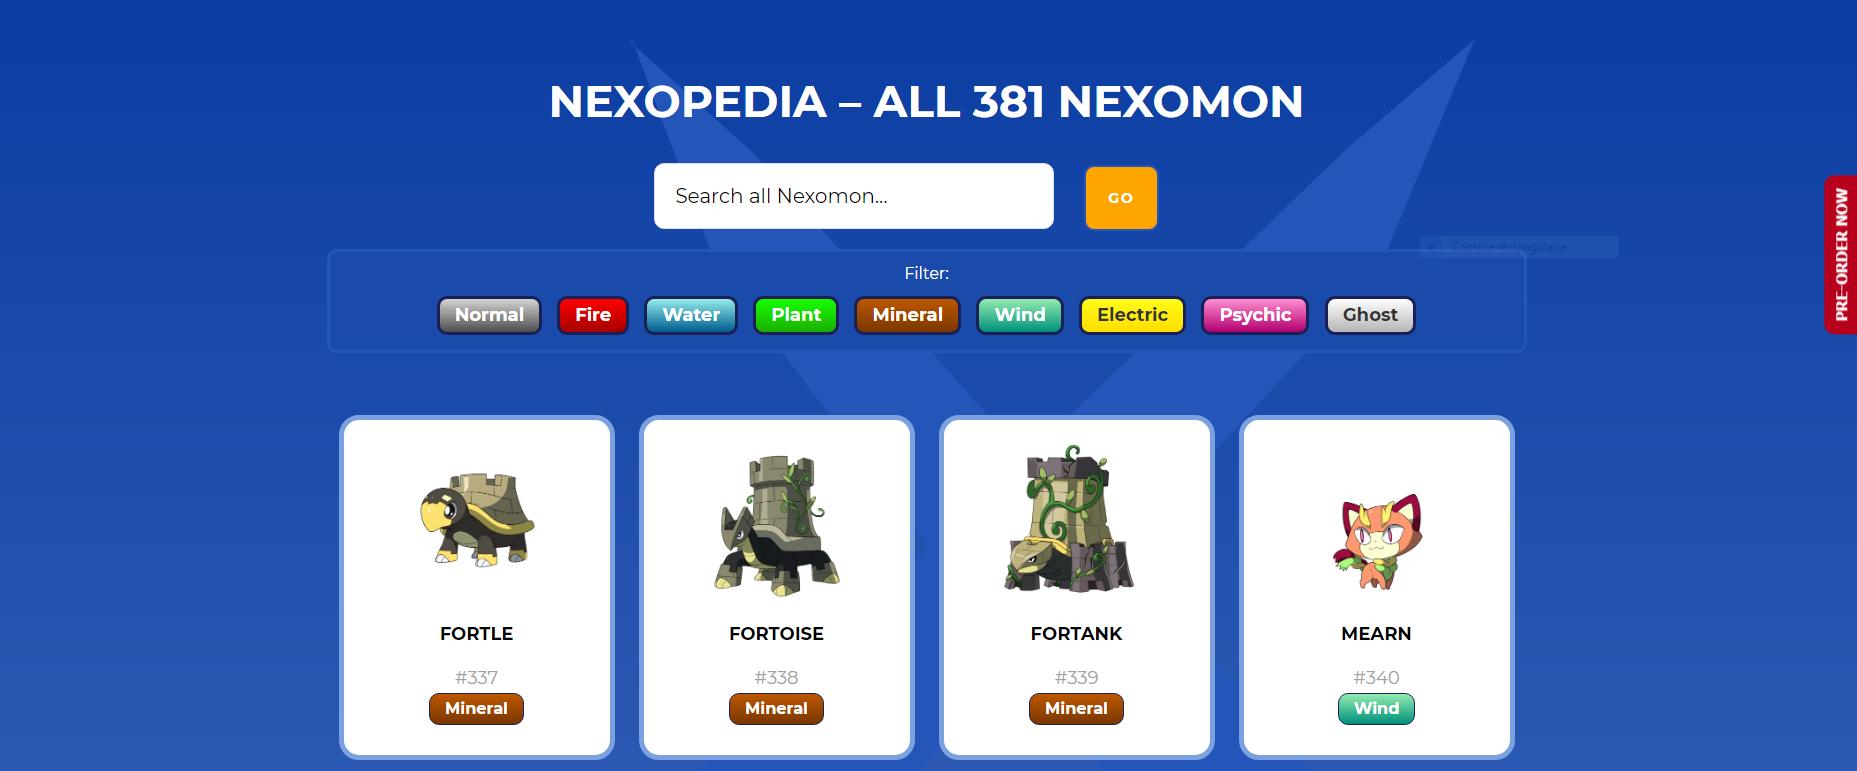 Nexopedia